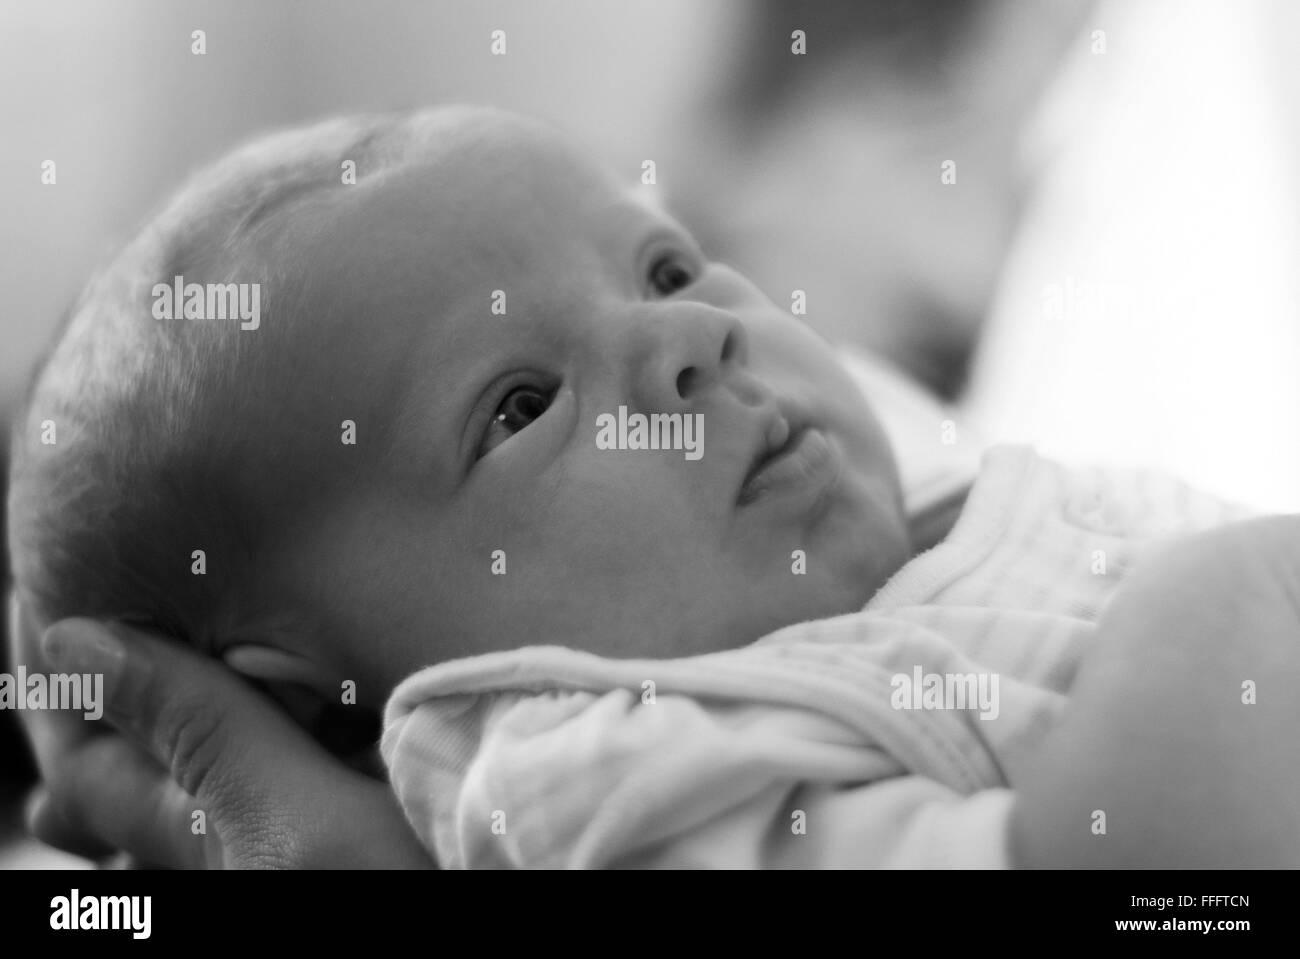 new born baby - Stock Image